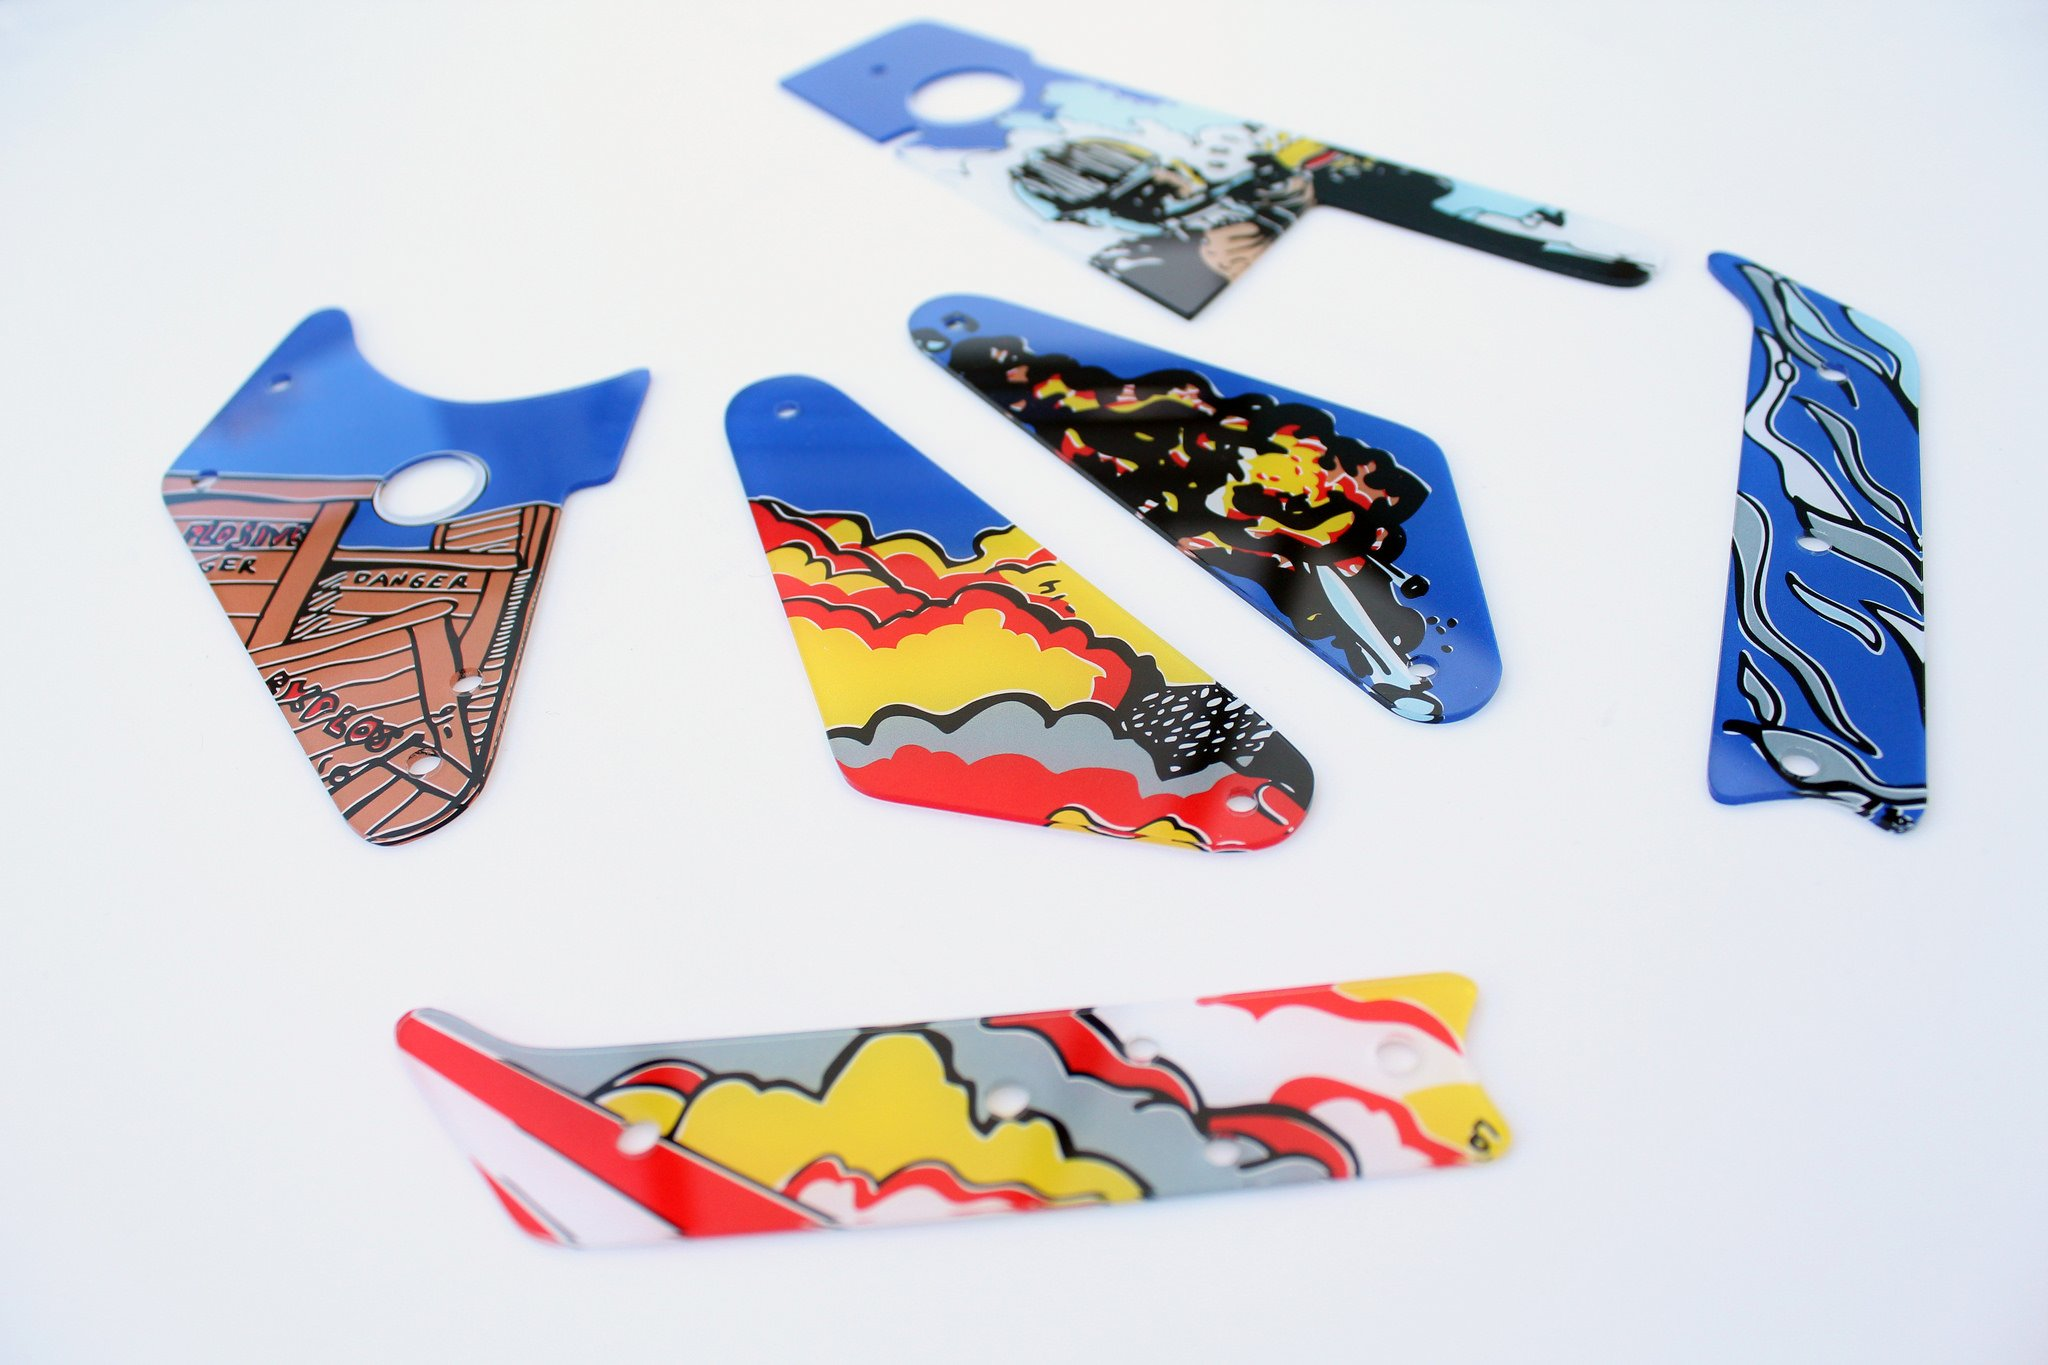 Lethal Weapon 3 Flipper Pinball Plastics Mini Kit 2